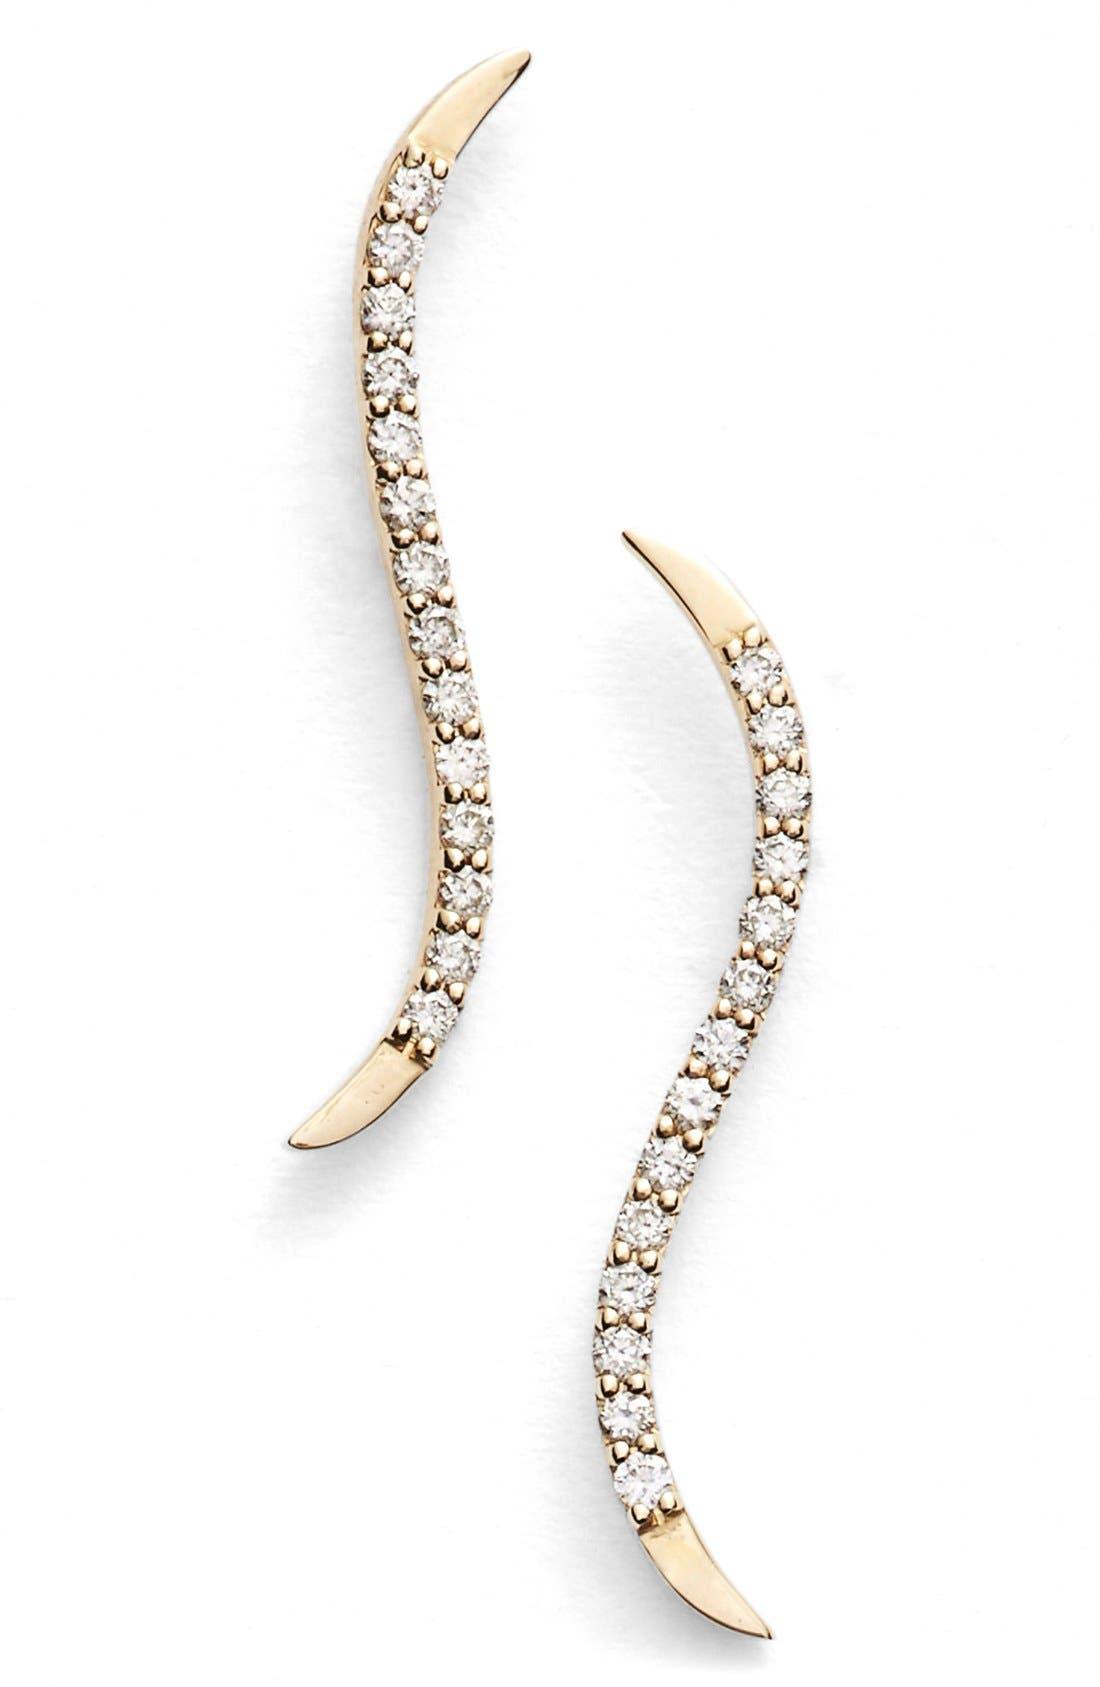 Main Image - Lana Jewelry 'Mirage' Diamond Stud Earrings